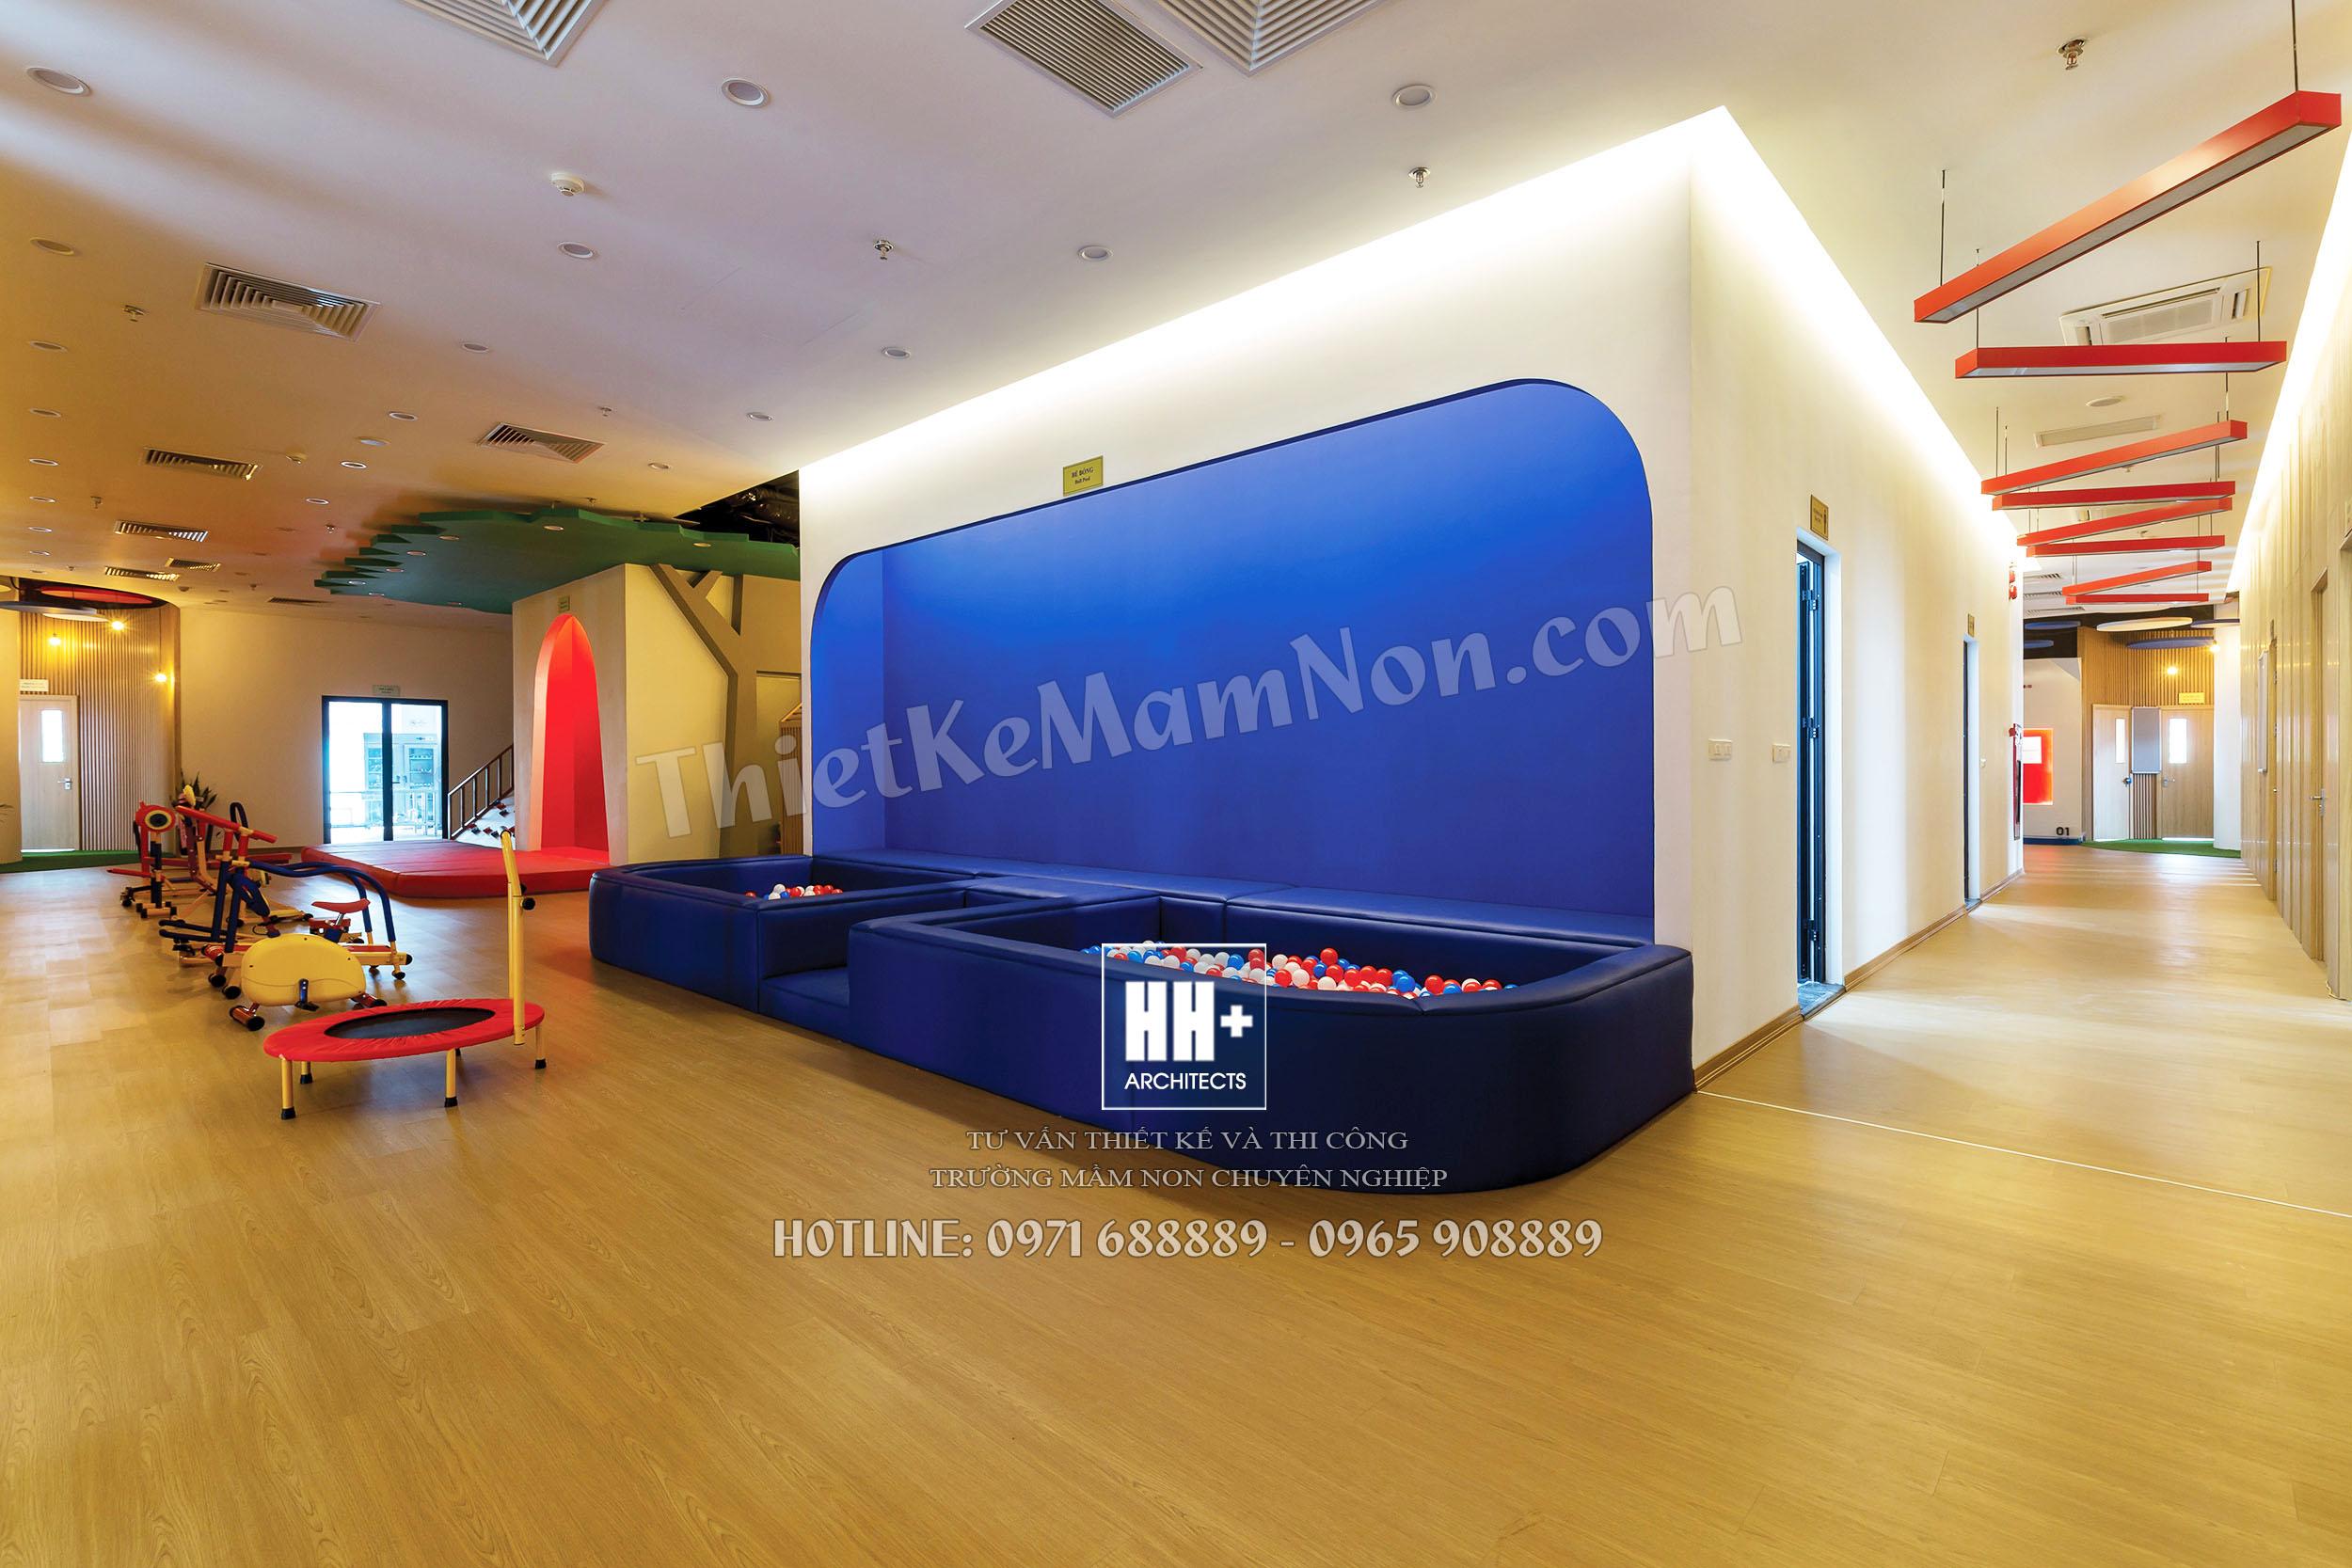 Rosemont_khuvandong_01 thiết kế trường mầm non Thiết kế trường mầm non Quốc Tế MỸ ROSEMONT Rosemont khuvandong 01